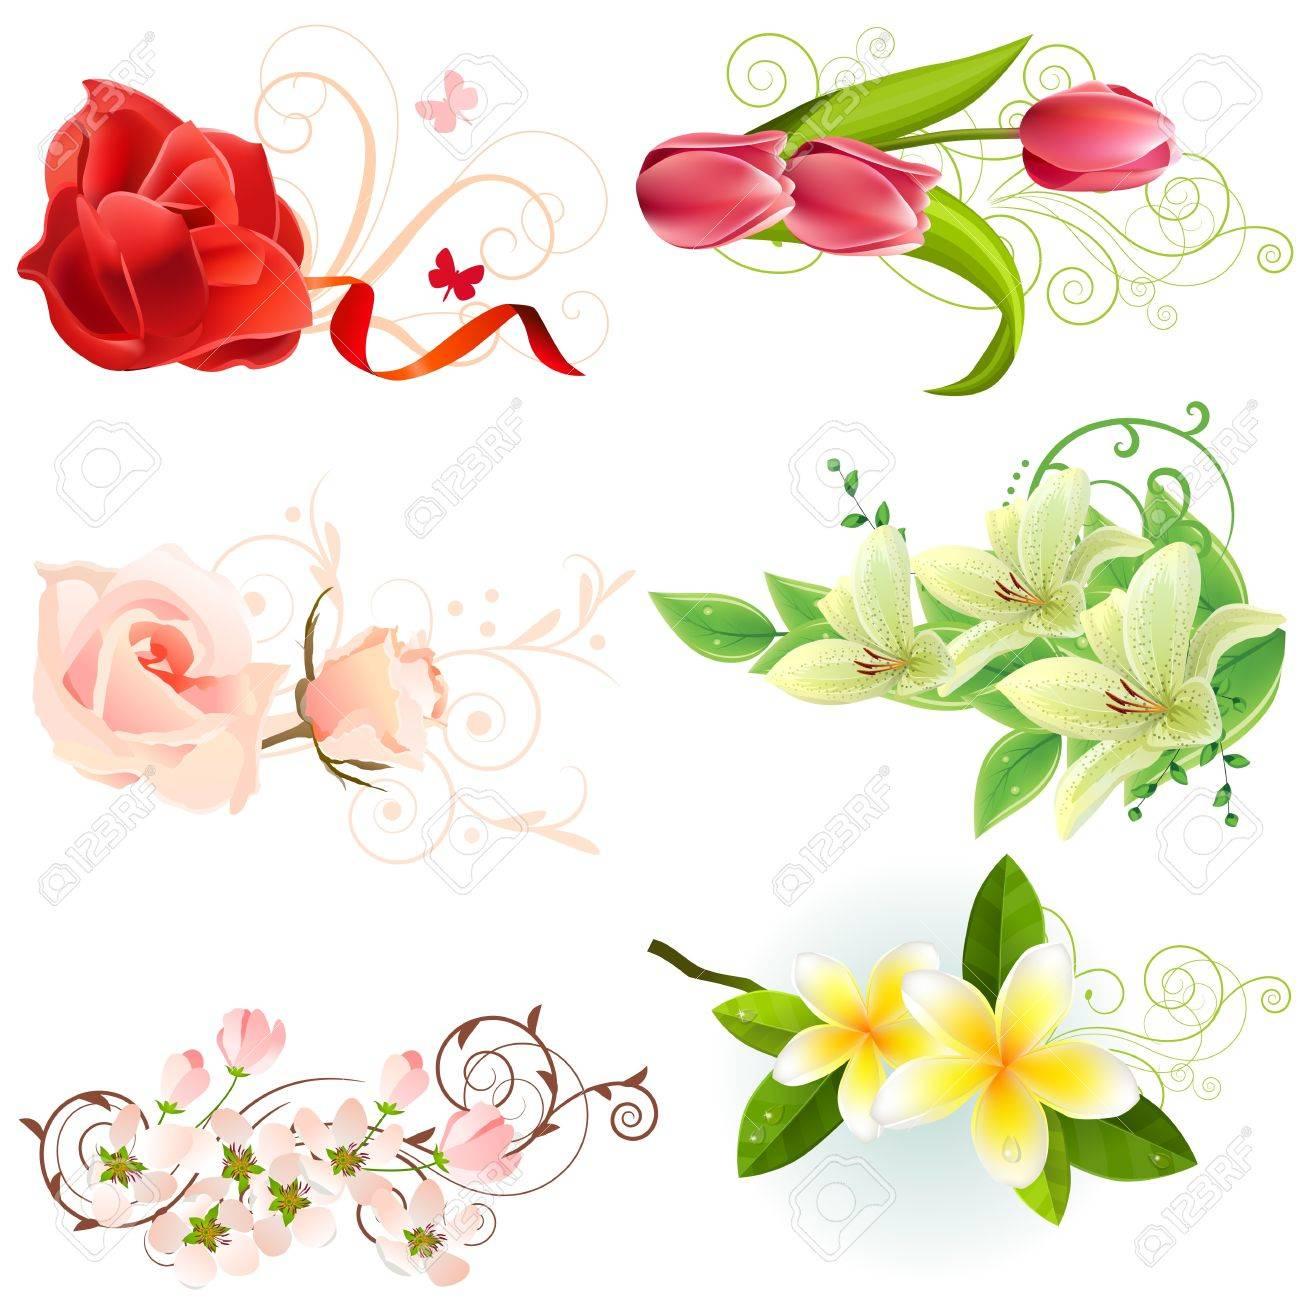 Floral design elements royalty free cliparts vectors and stock floral design elements stock vector 8714538 dhlflorist Images